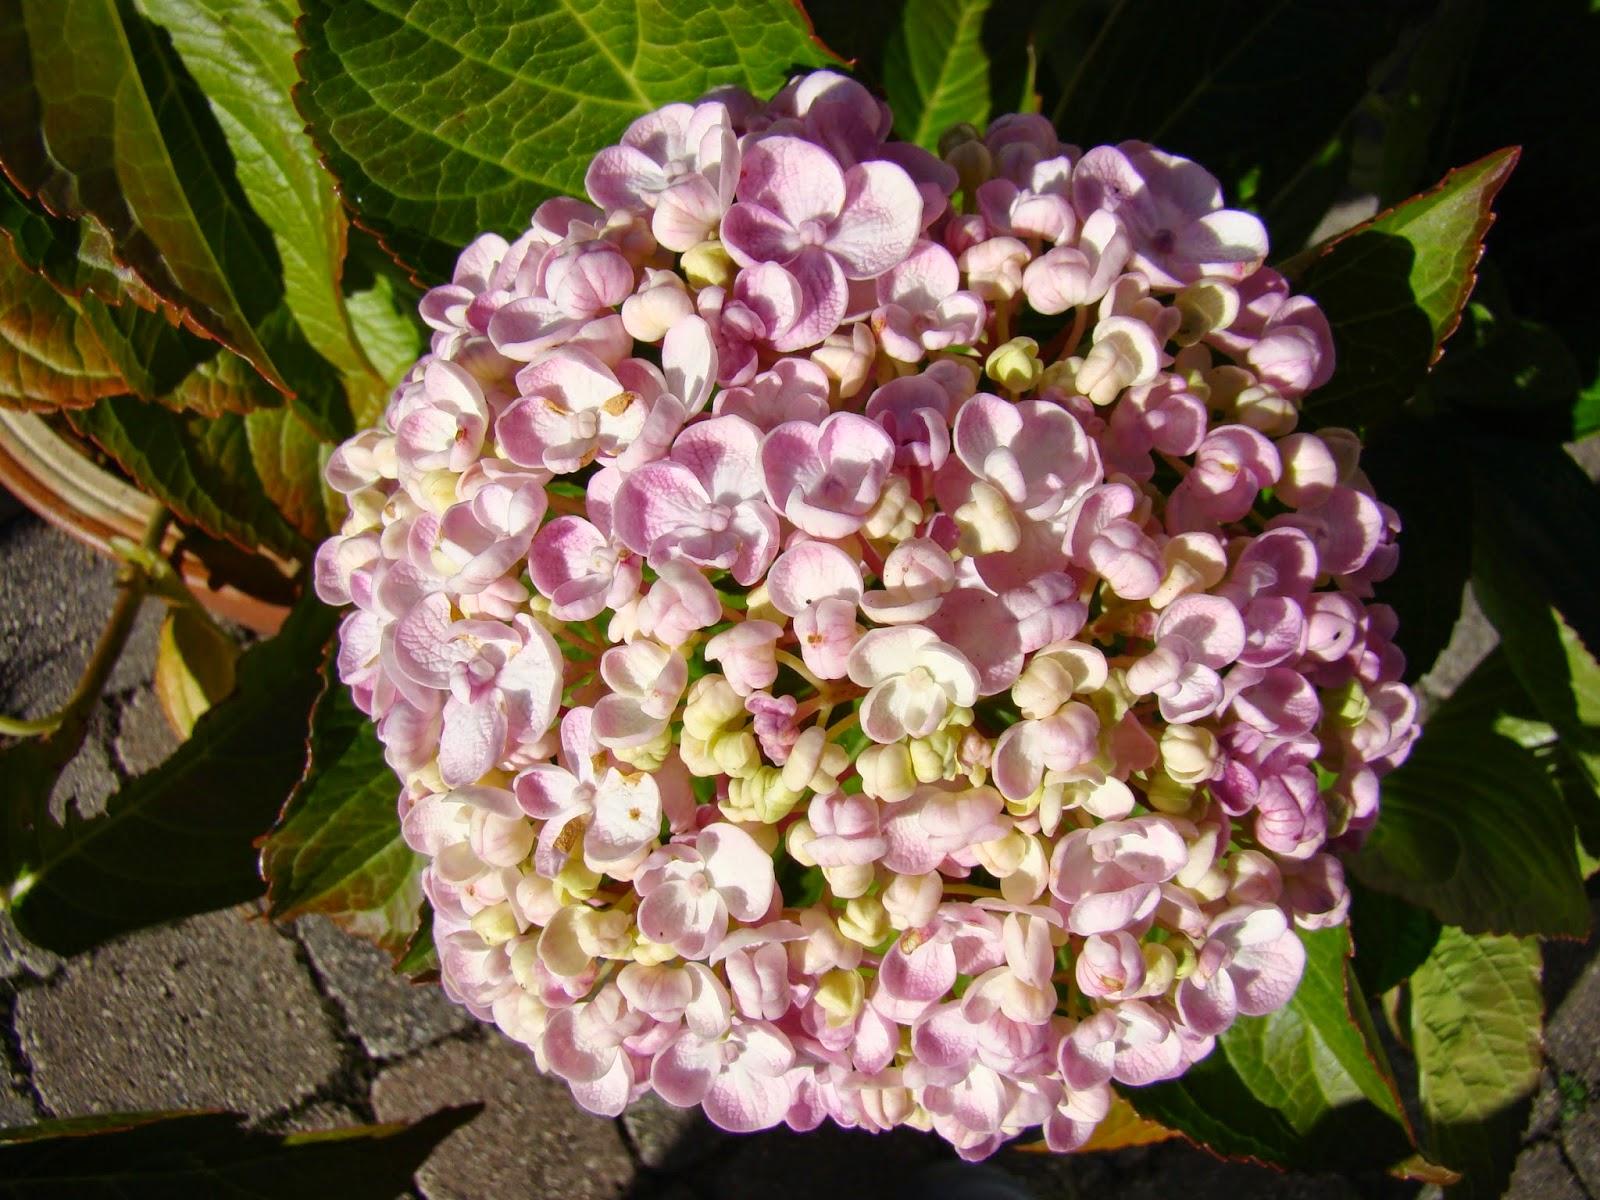 hydrangea macrophylla ayesha ou hortensia à fleurs de lilas